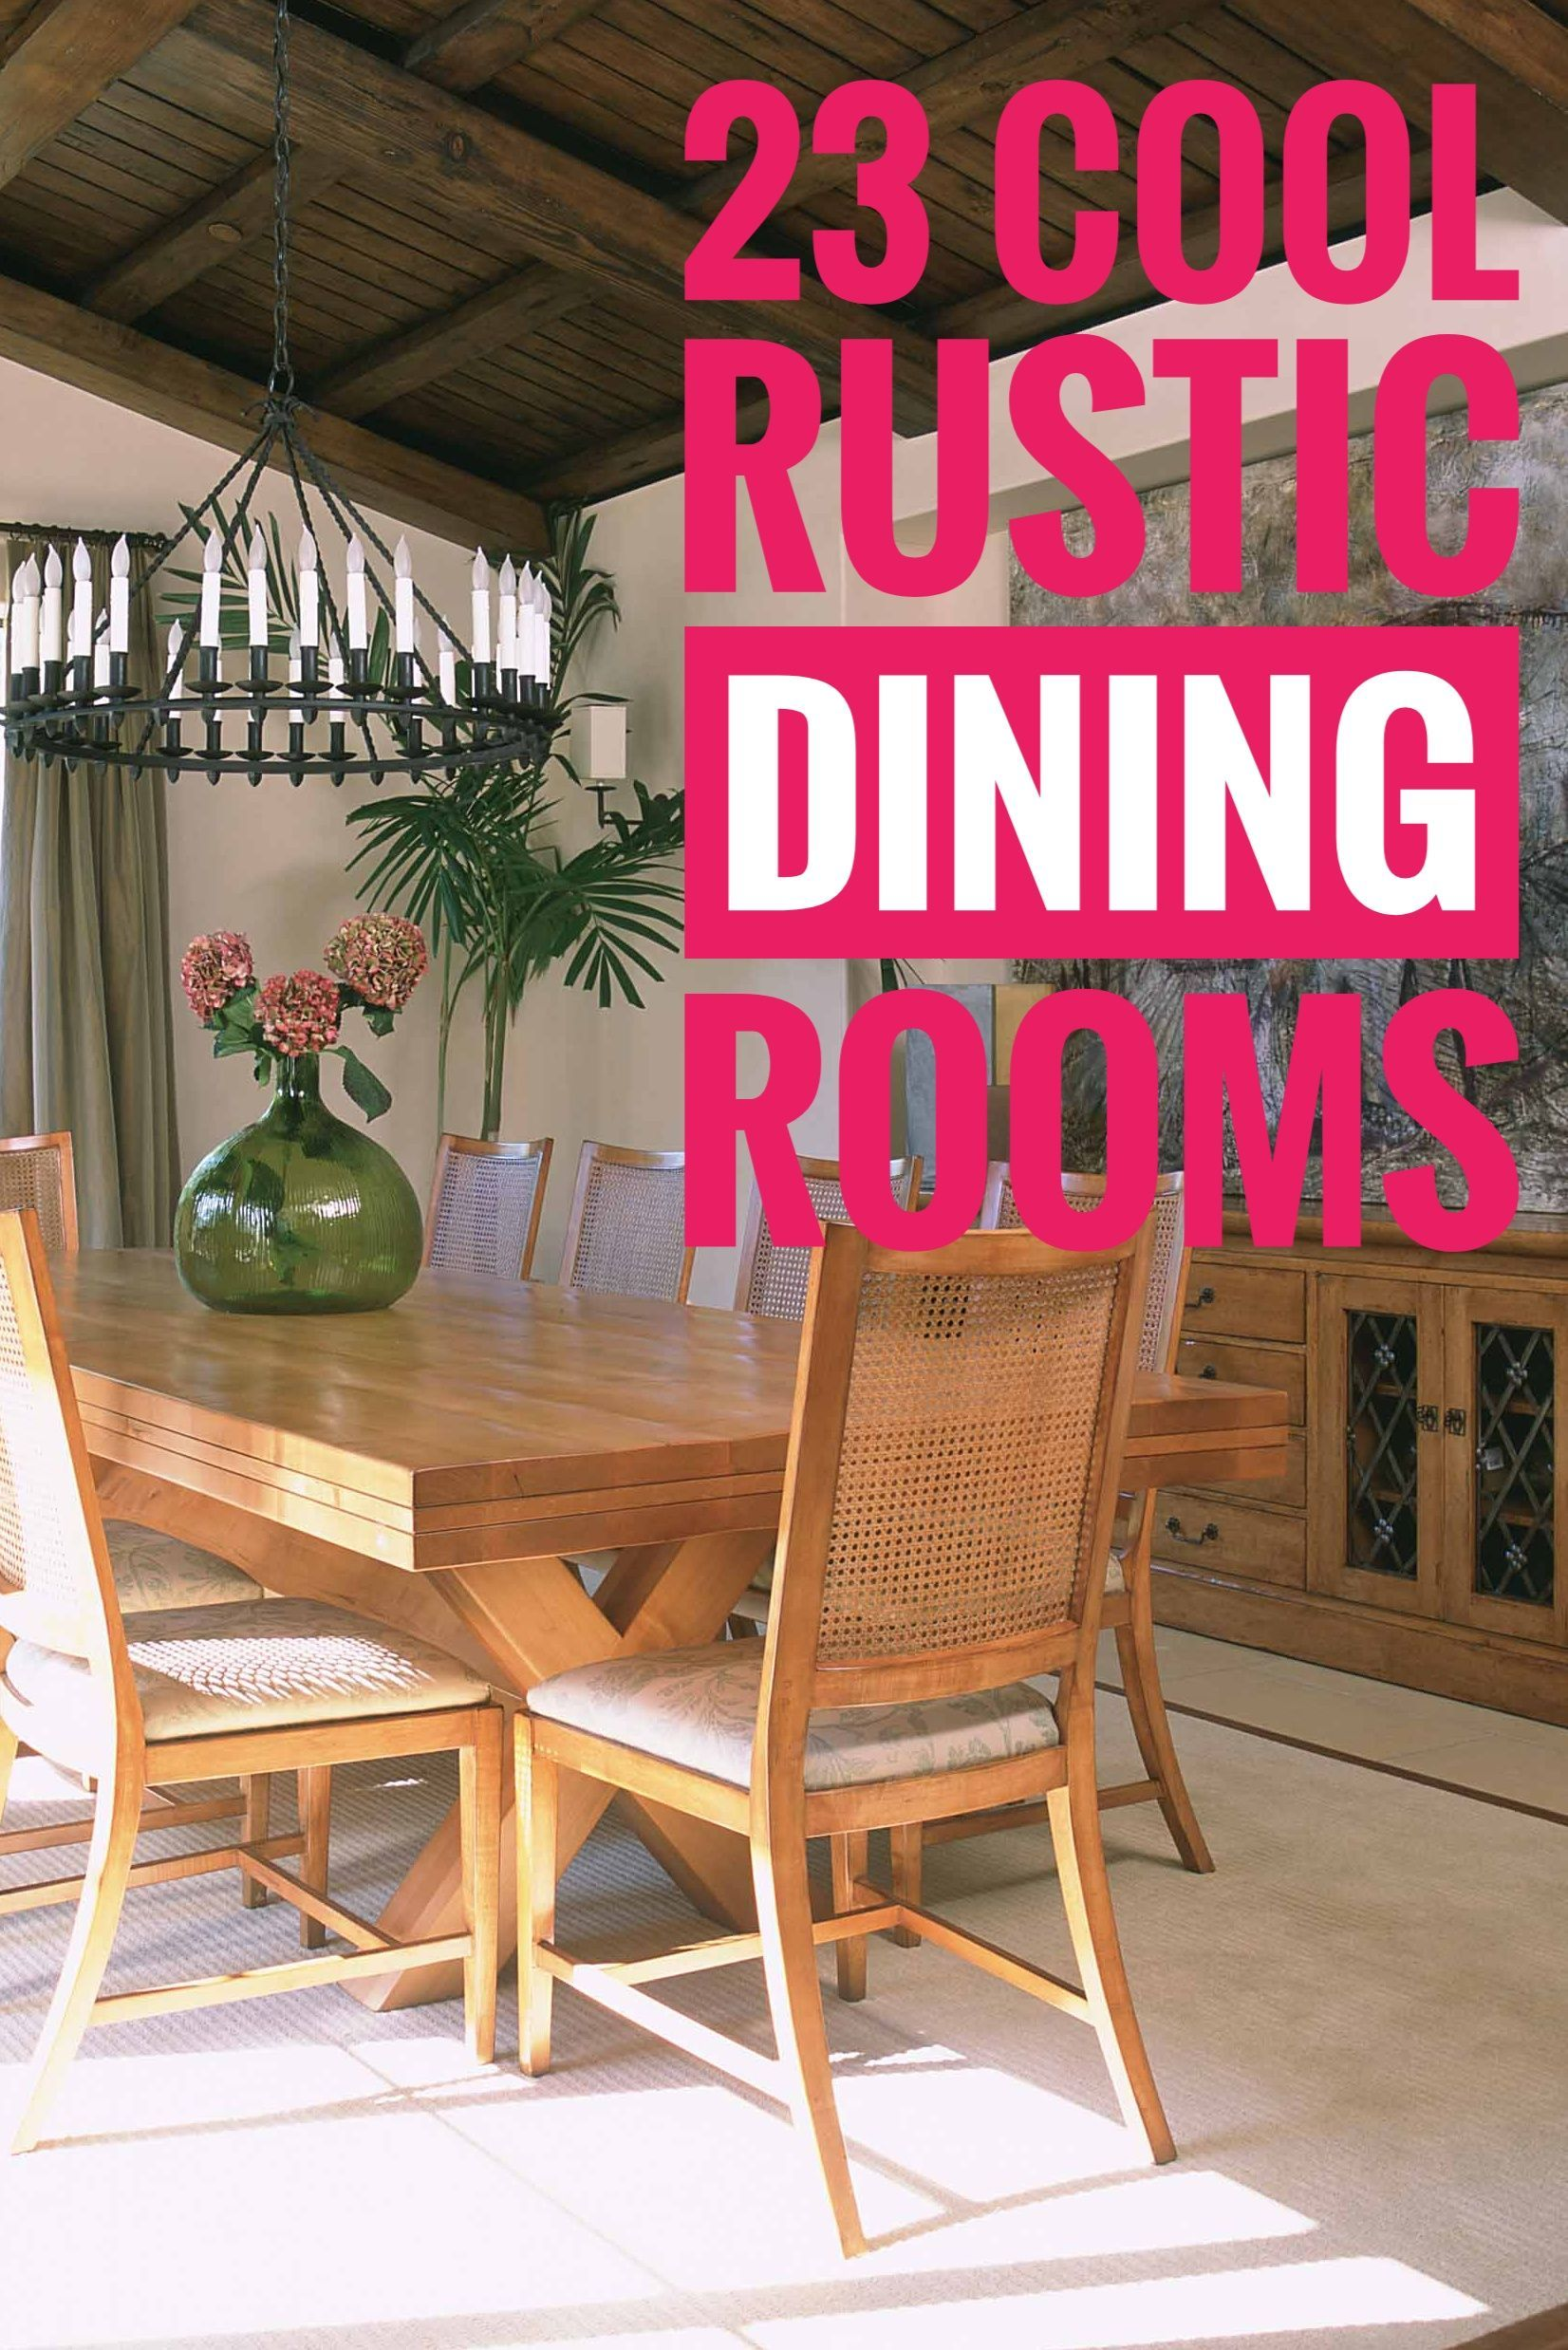 23 Cool Rustic Dining Room Designs Rustic Dining Room Rustic